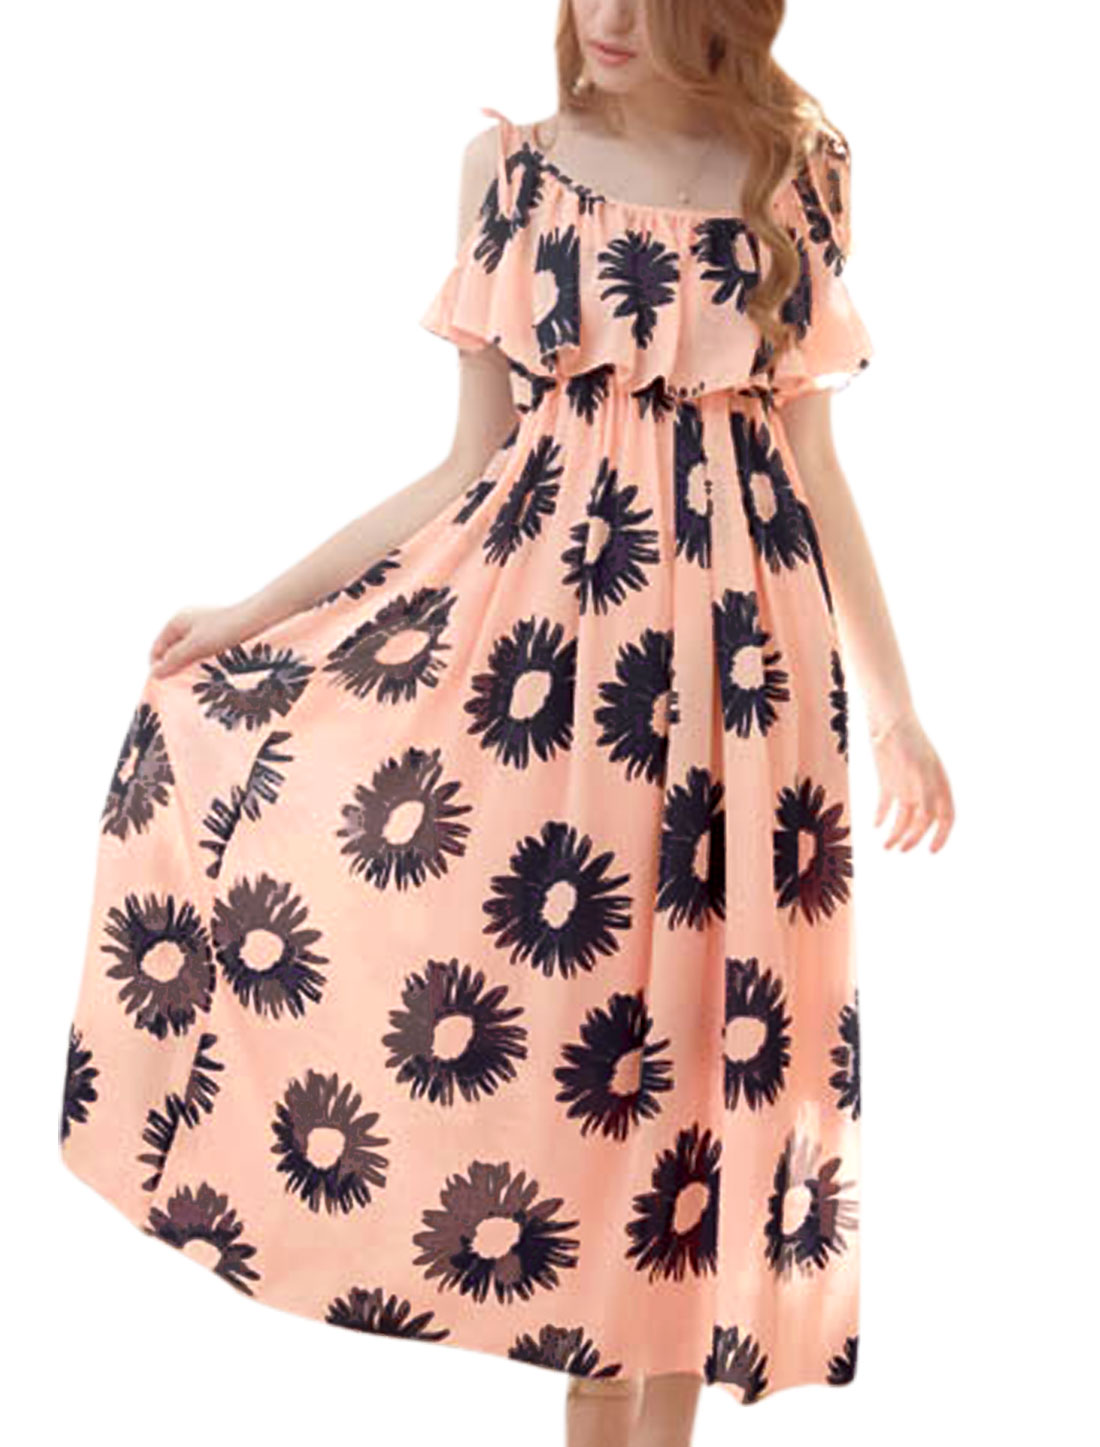 Ladies Adjustable Spaghetti Straps Sunflower Pattern Chiffon Dress Coral Pink M